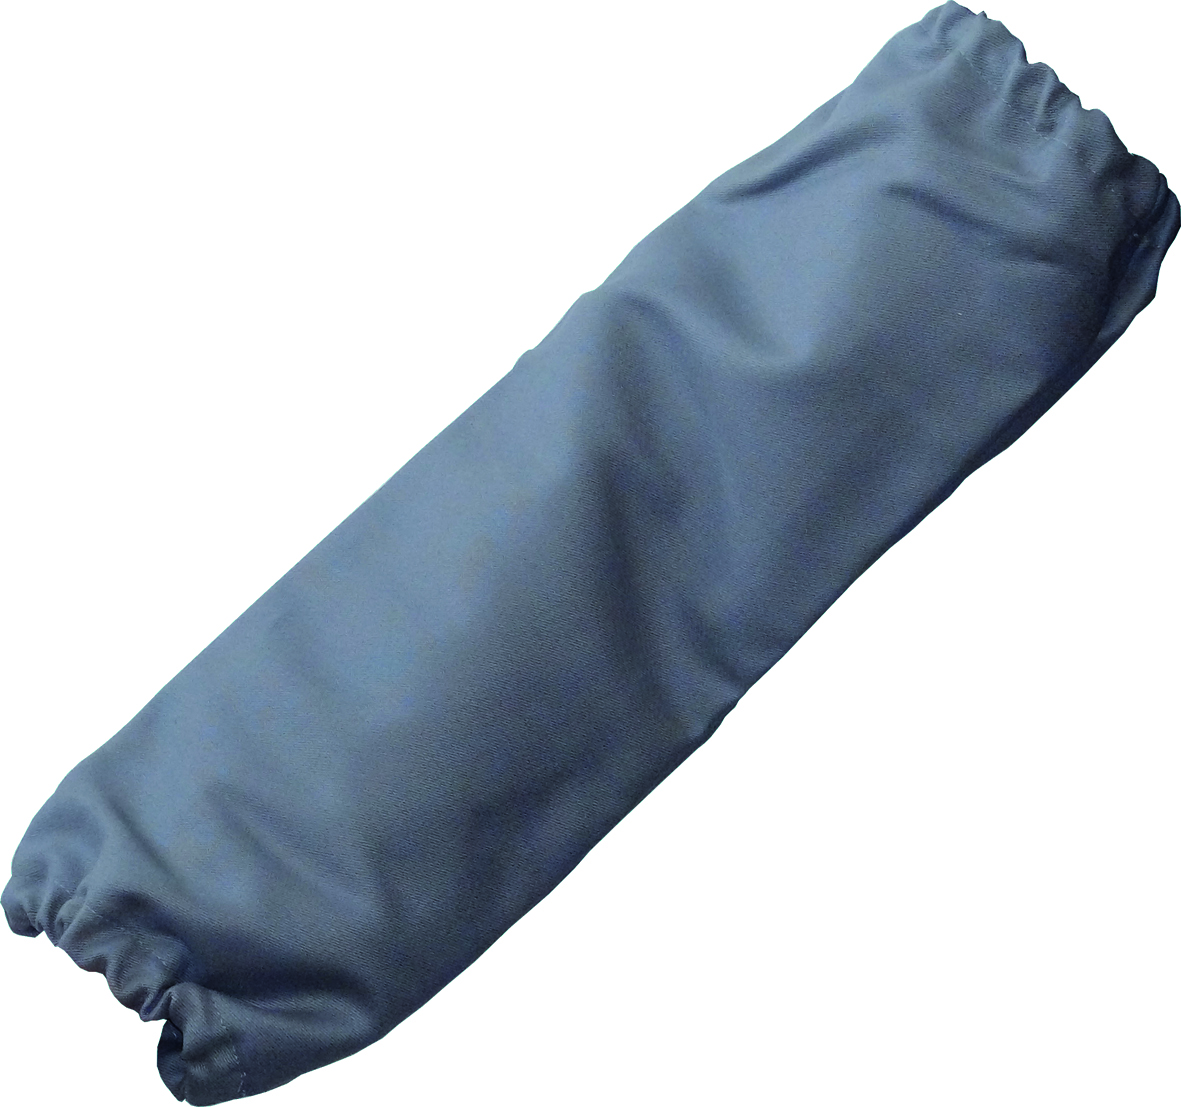 Proban Armschoner, 40 cm, Gummizug an beiden Seiten